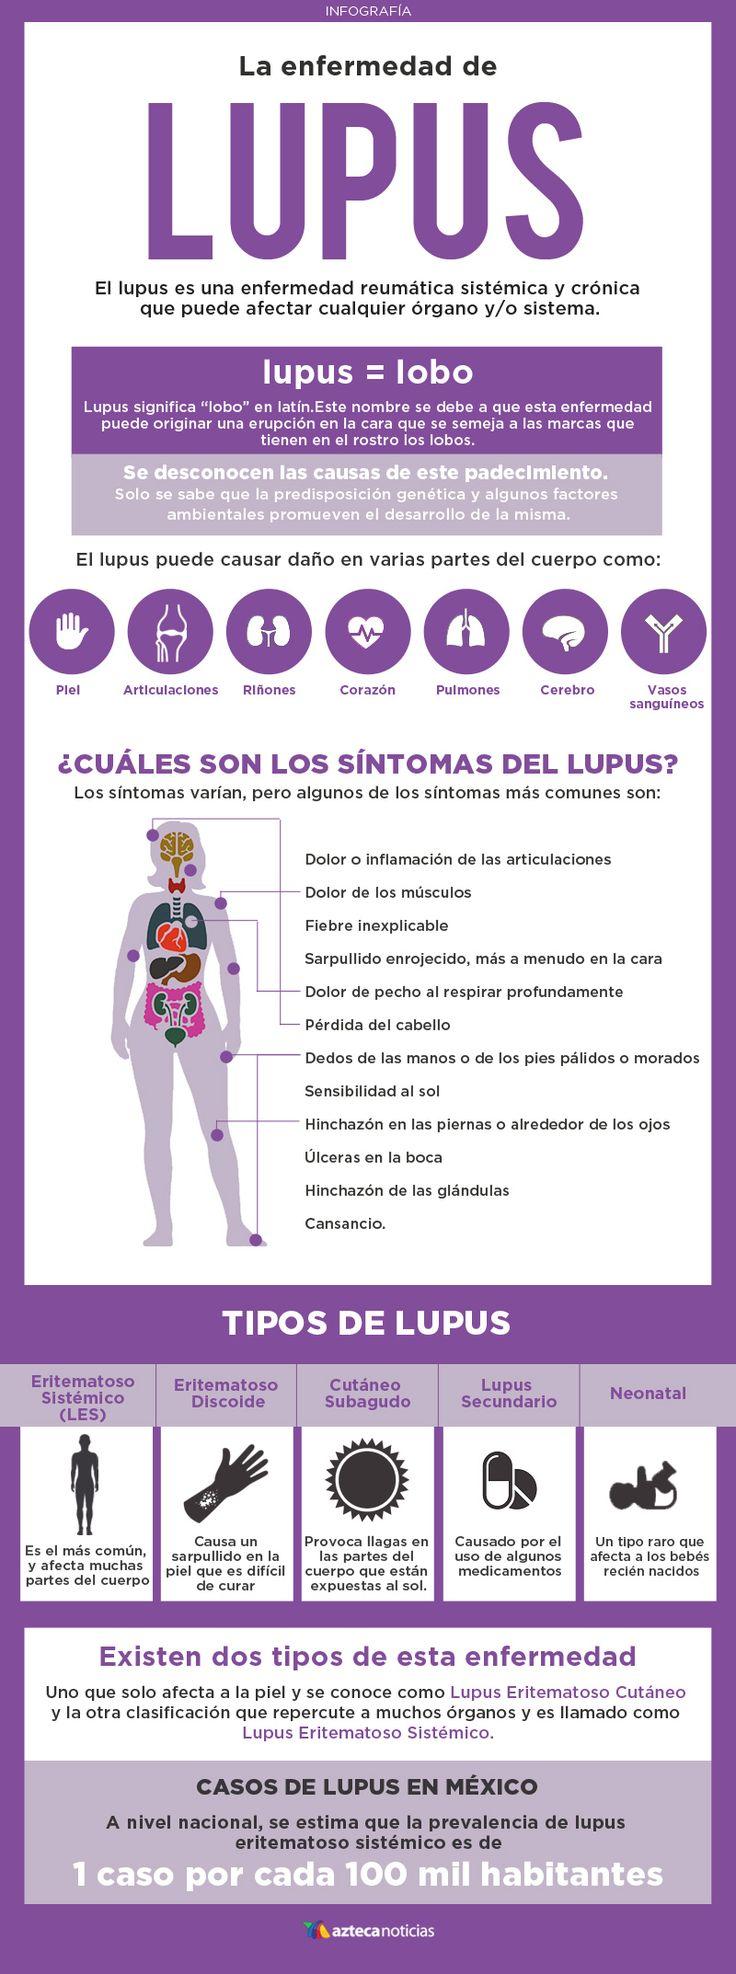 La enfermedad de Lupus #infografia